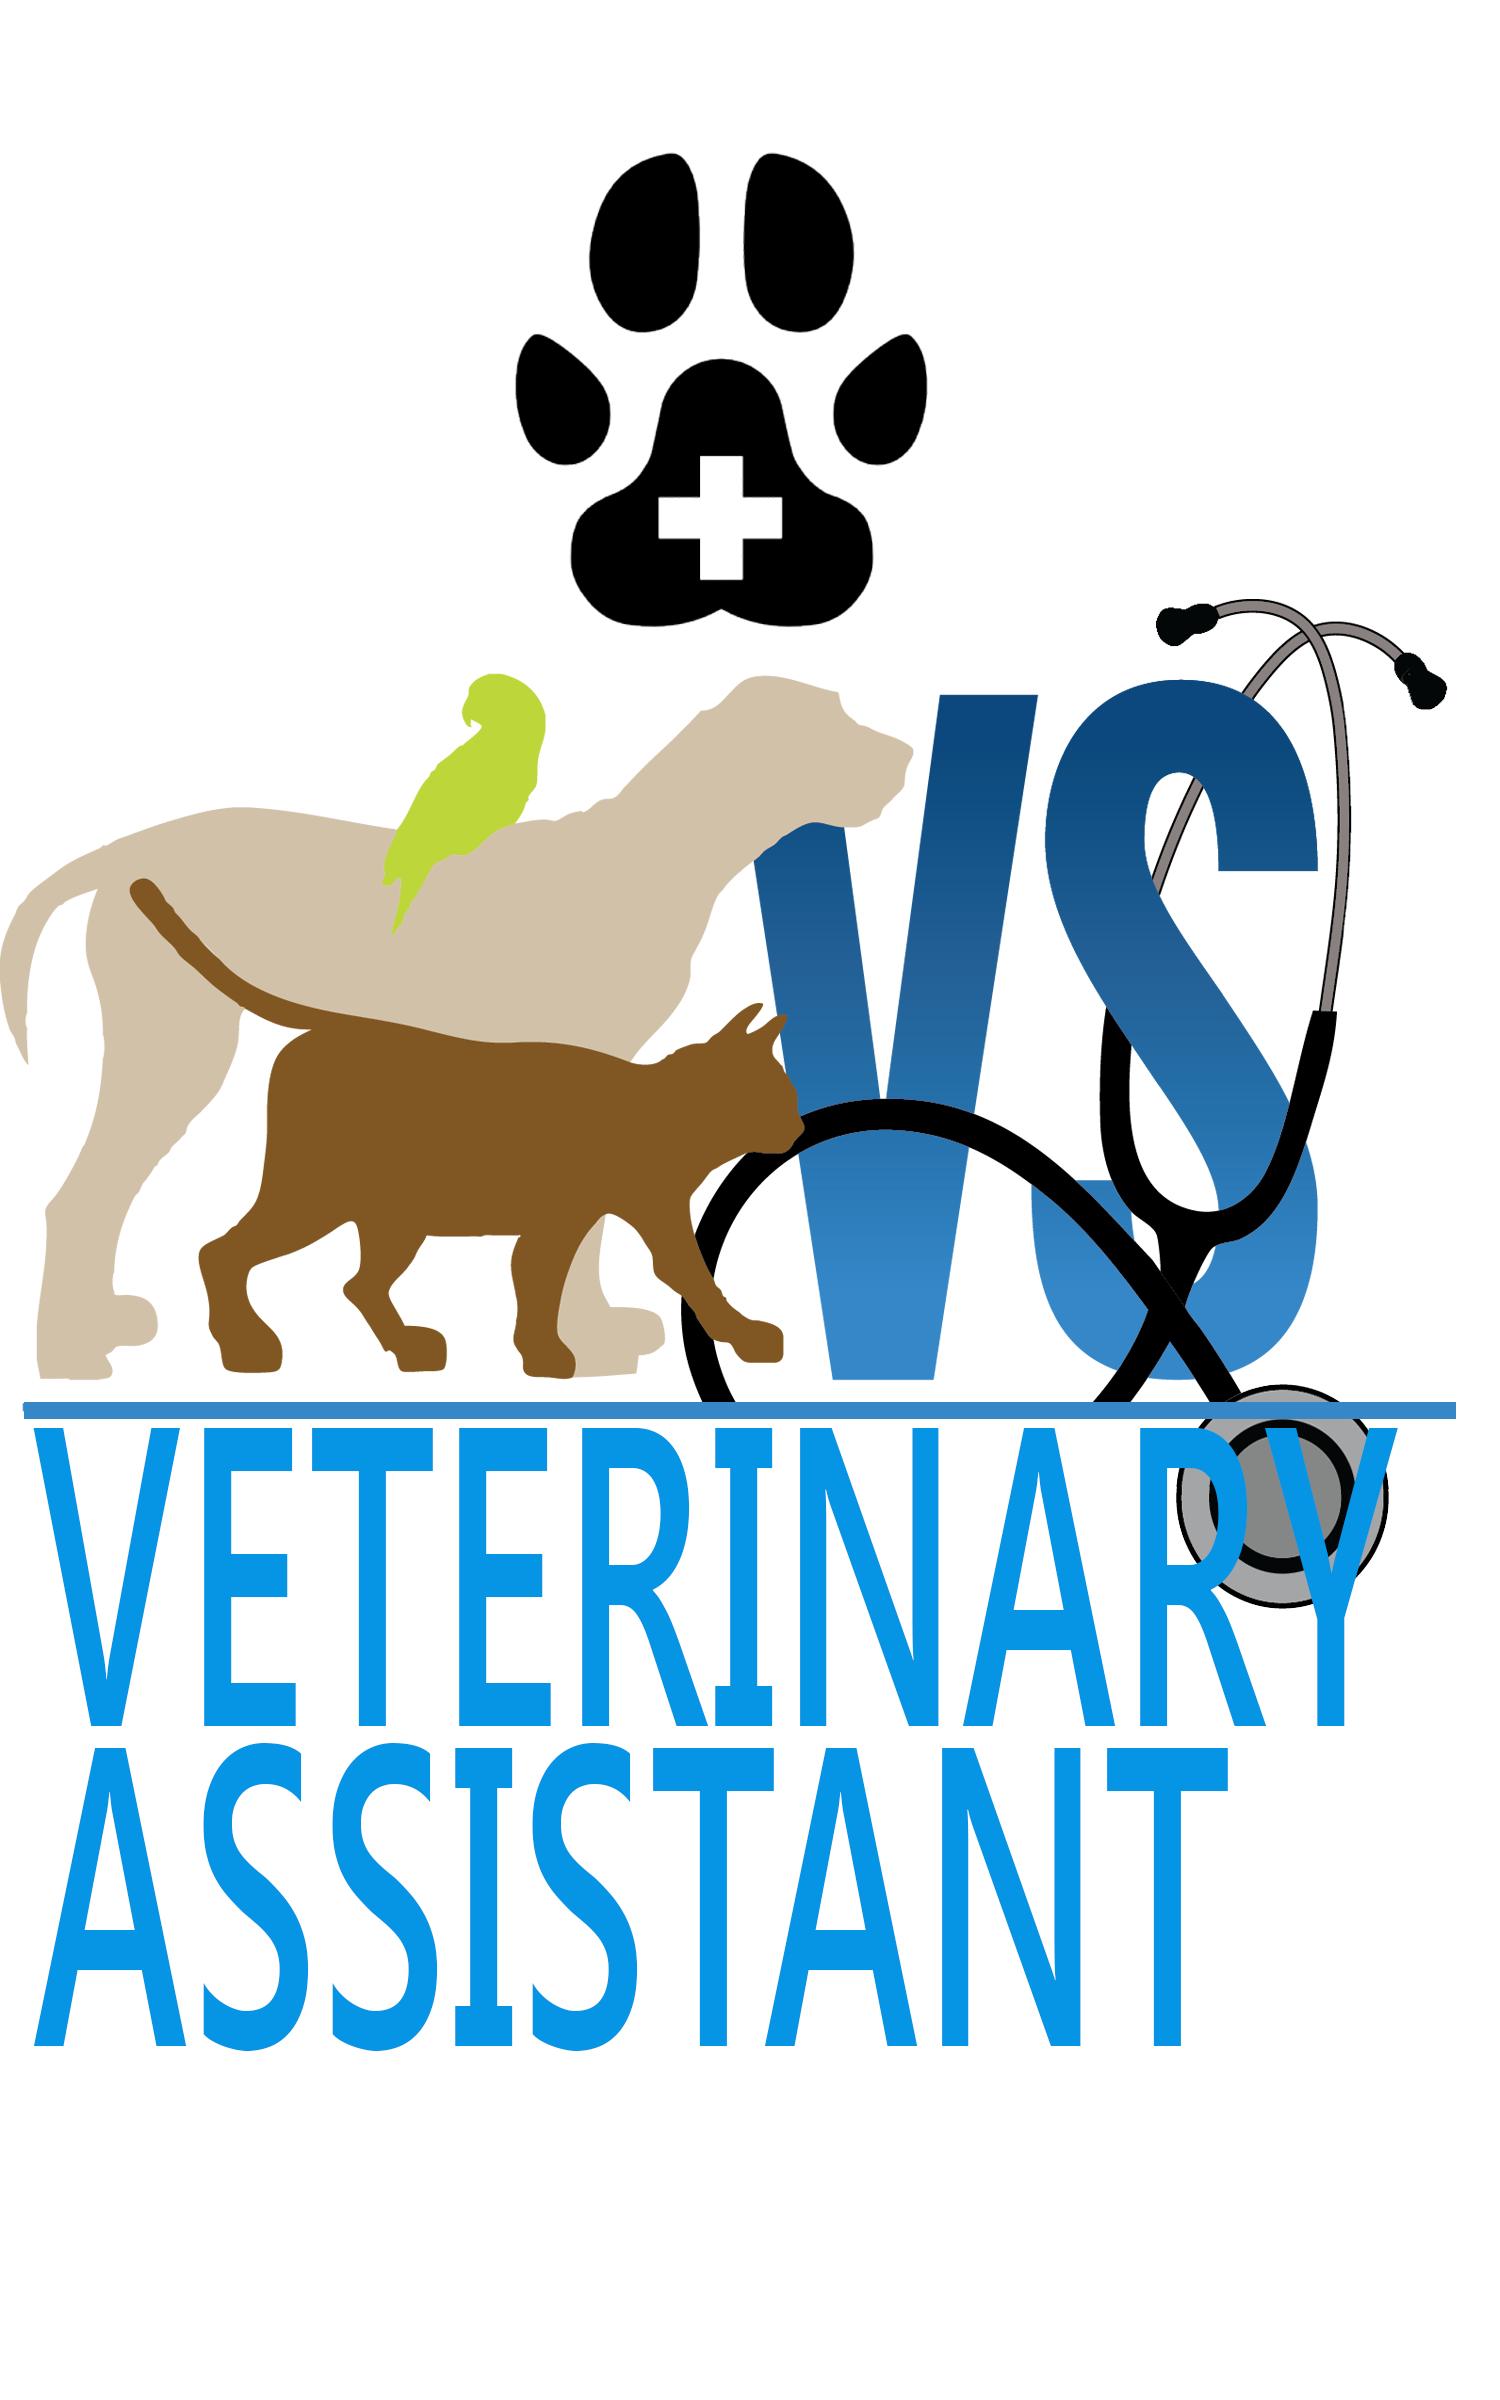 Veterinary Assistant - Vet Assistant PNG